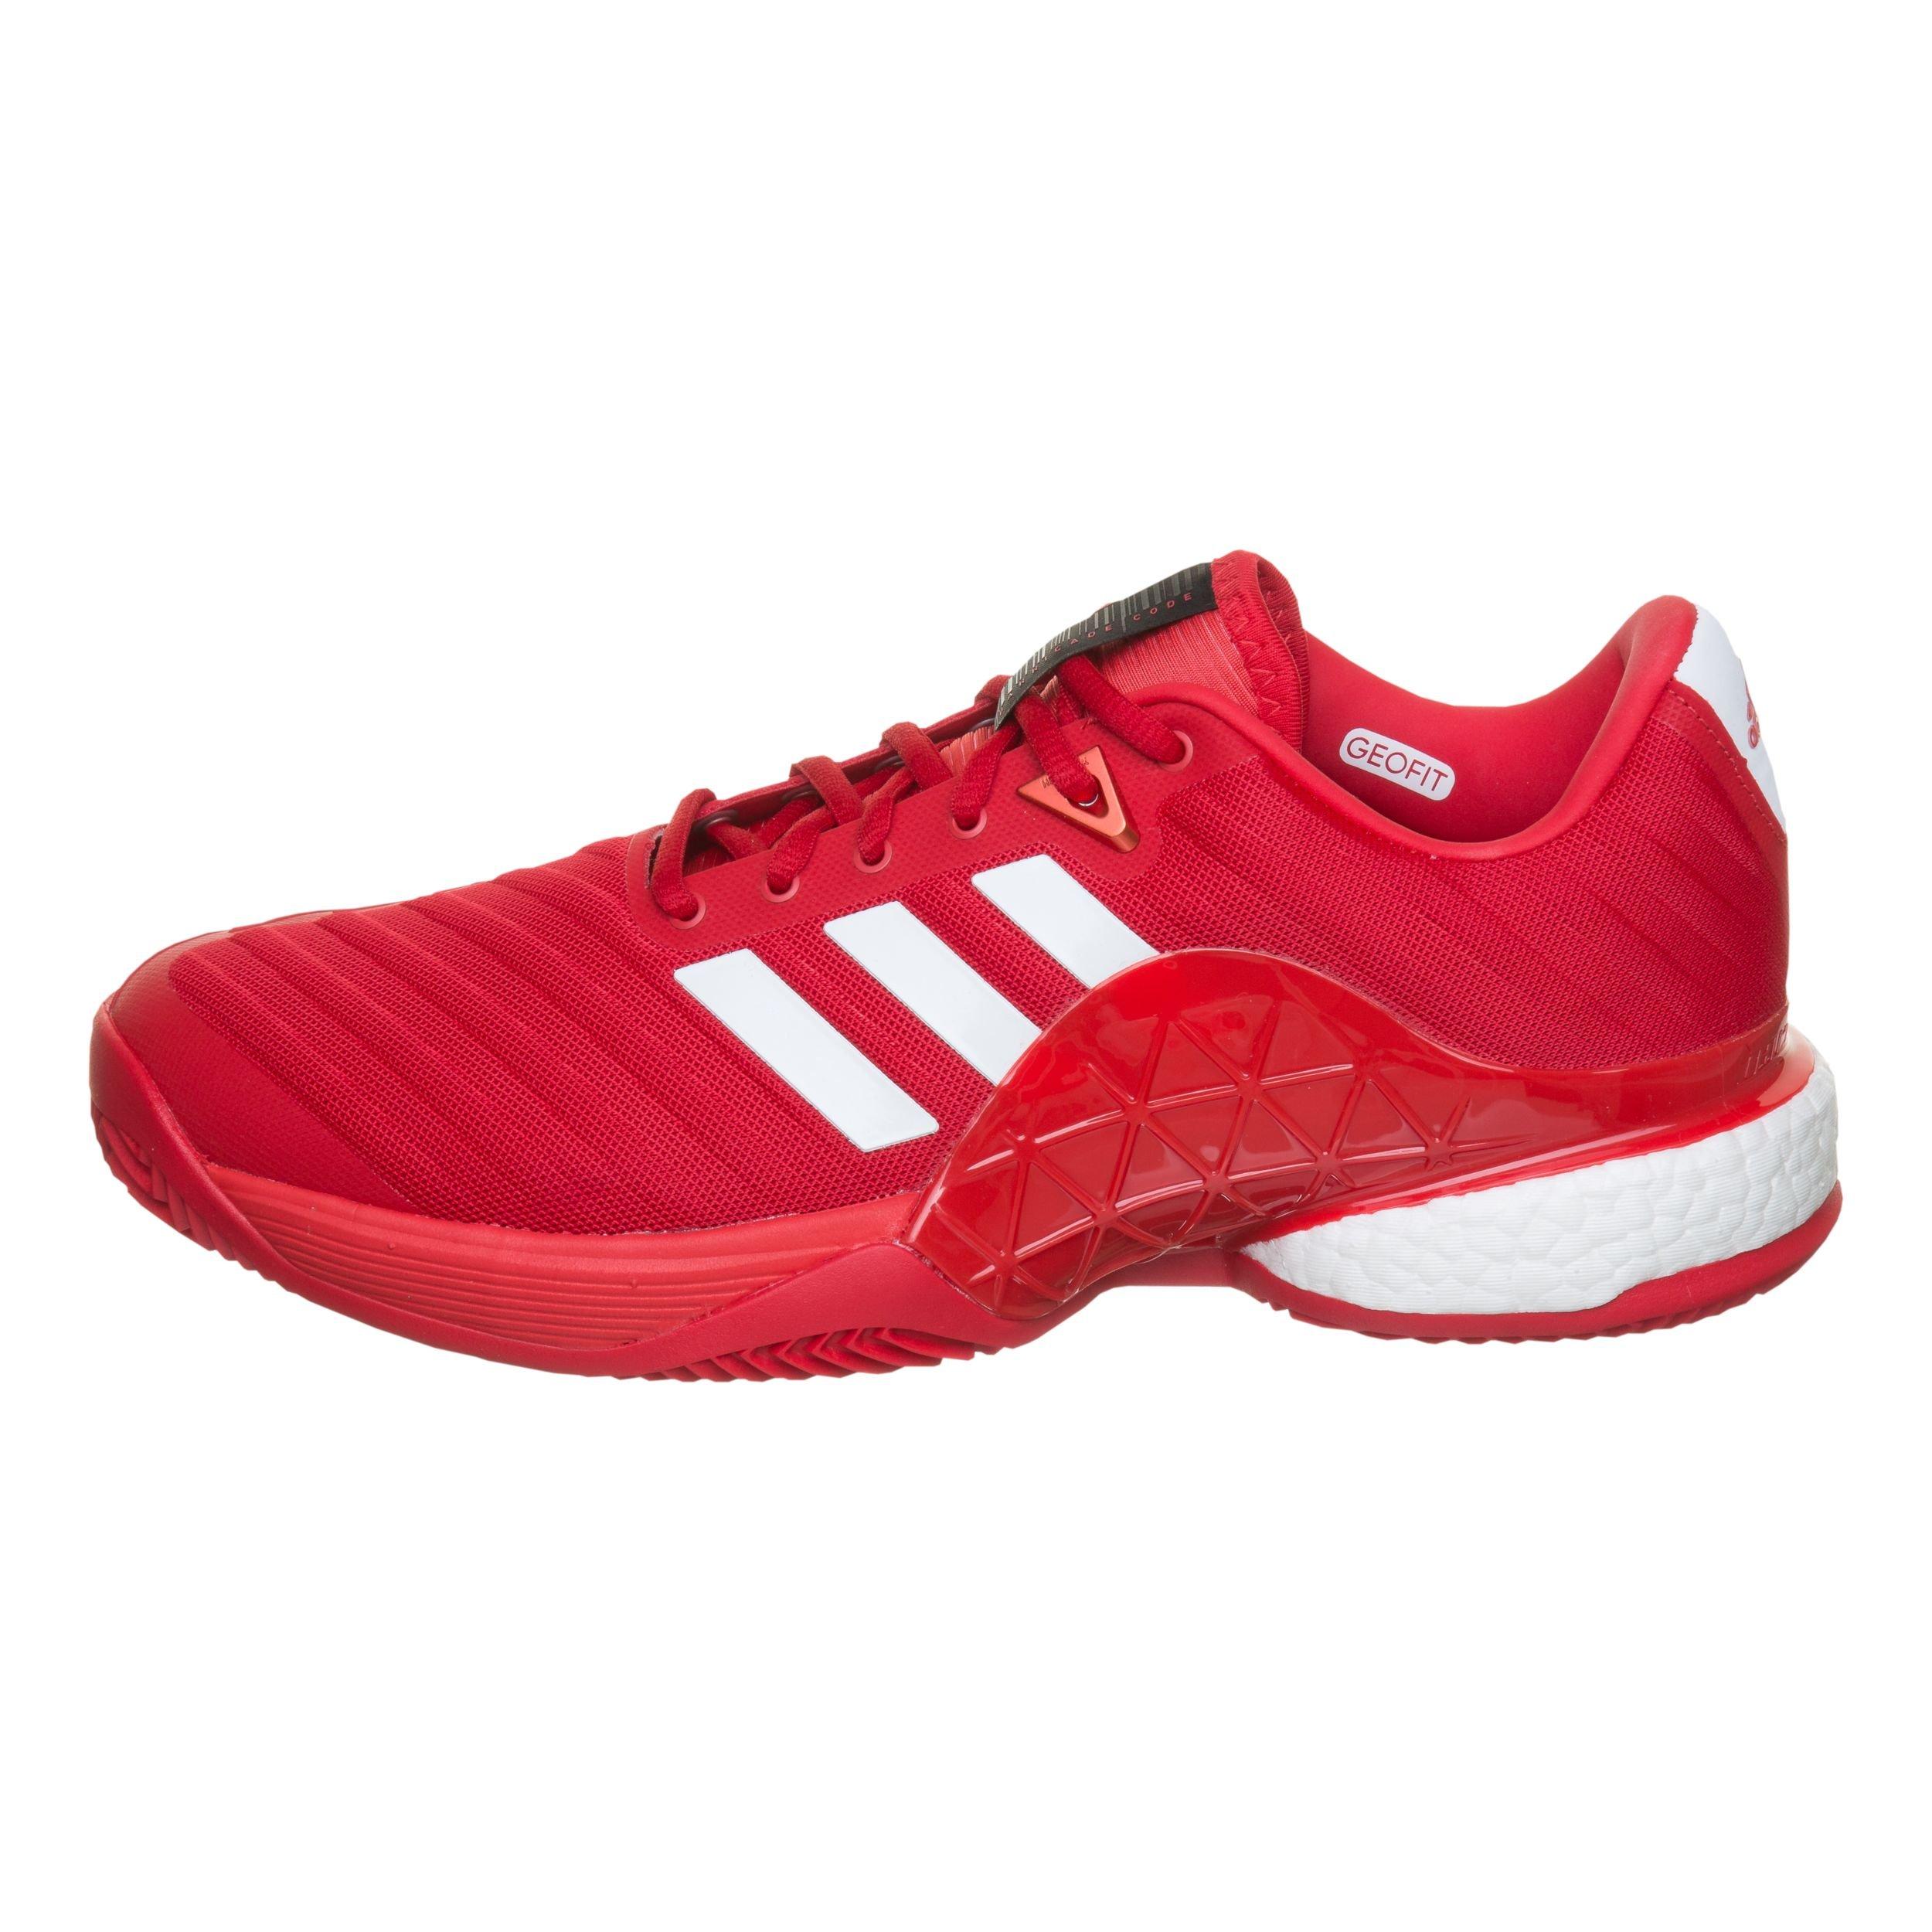 adidas - Barricade Boost clay men's tennis shoes (red/black) - EU ...